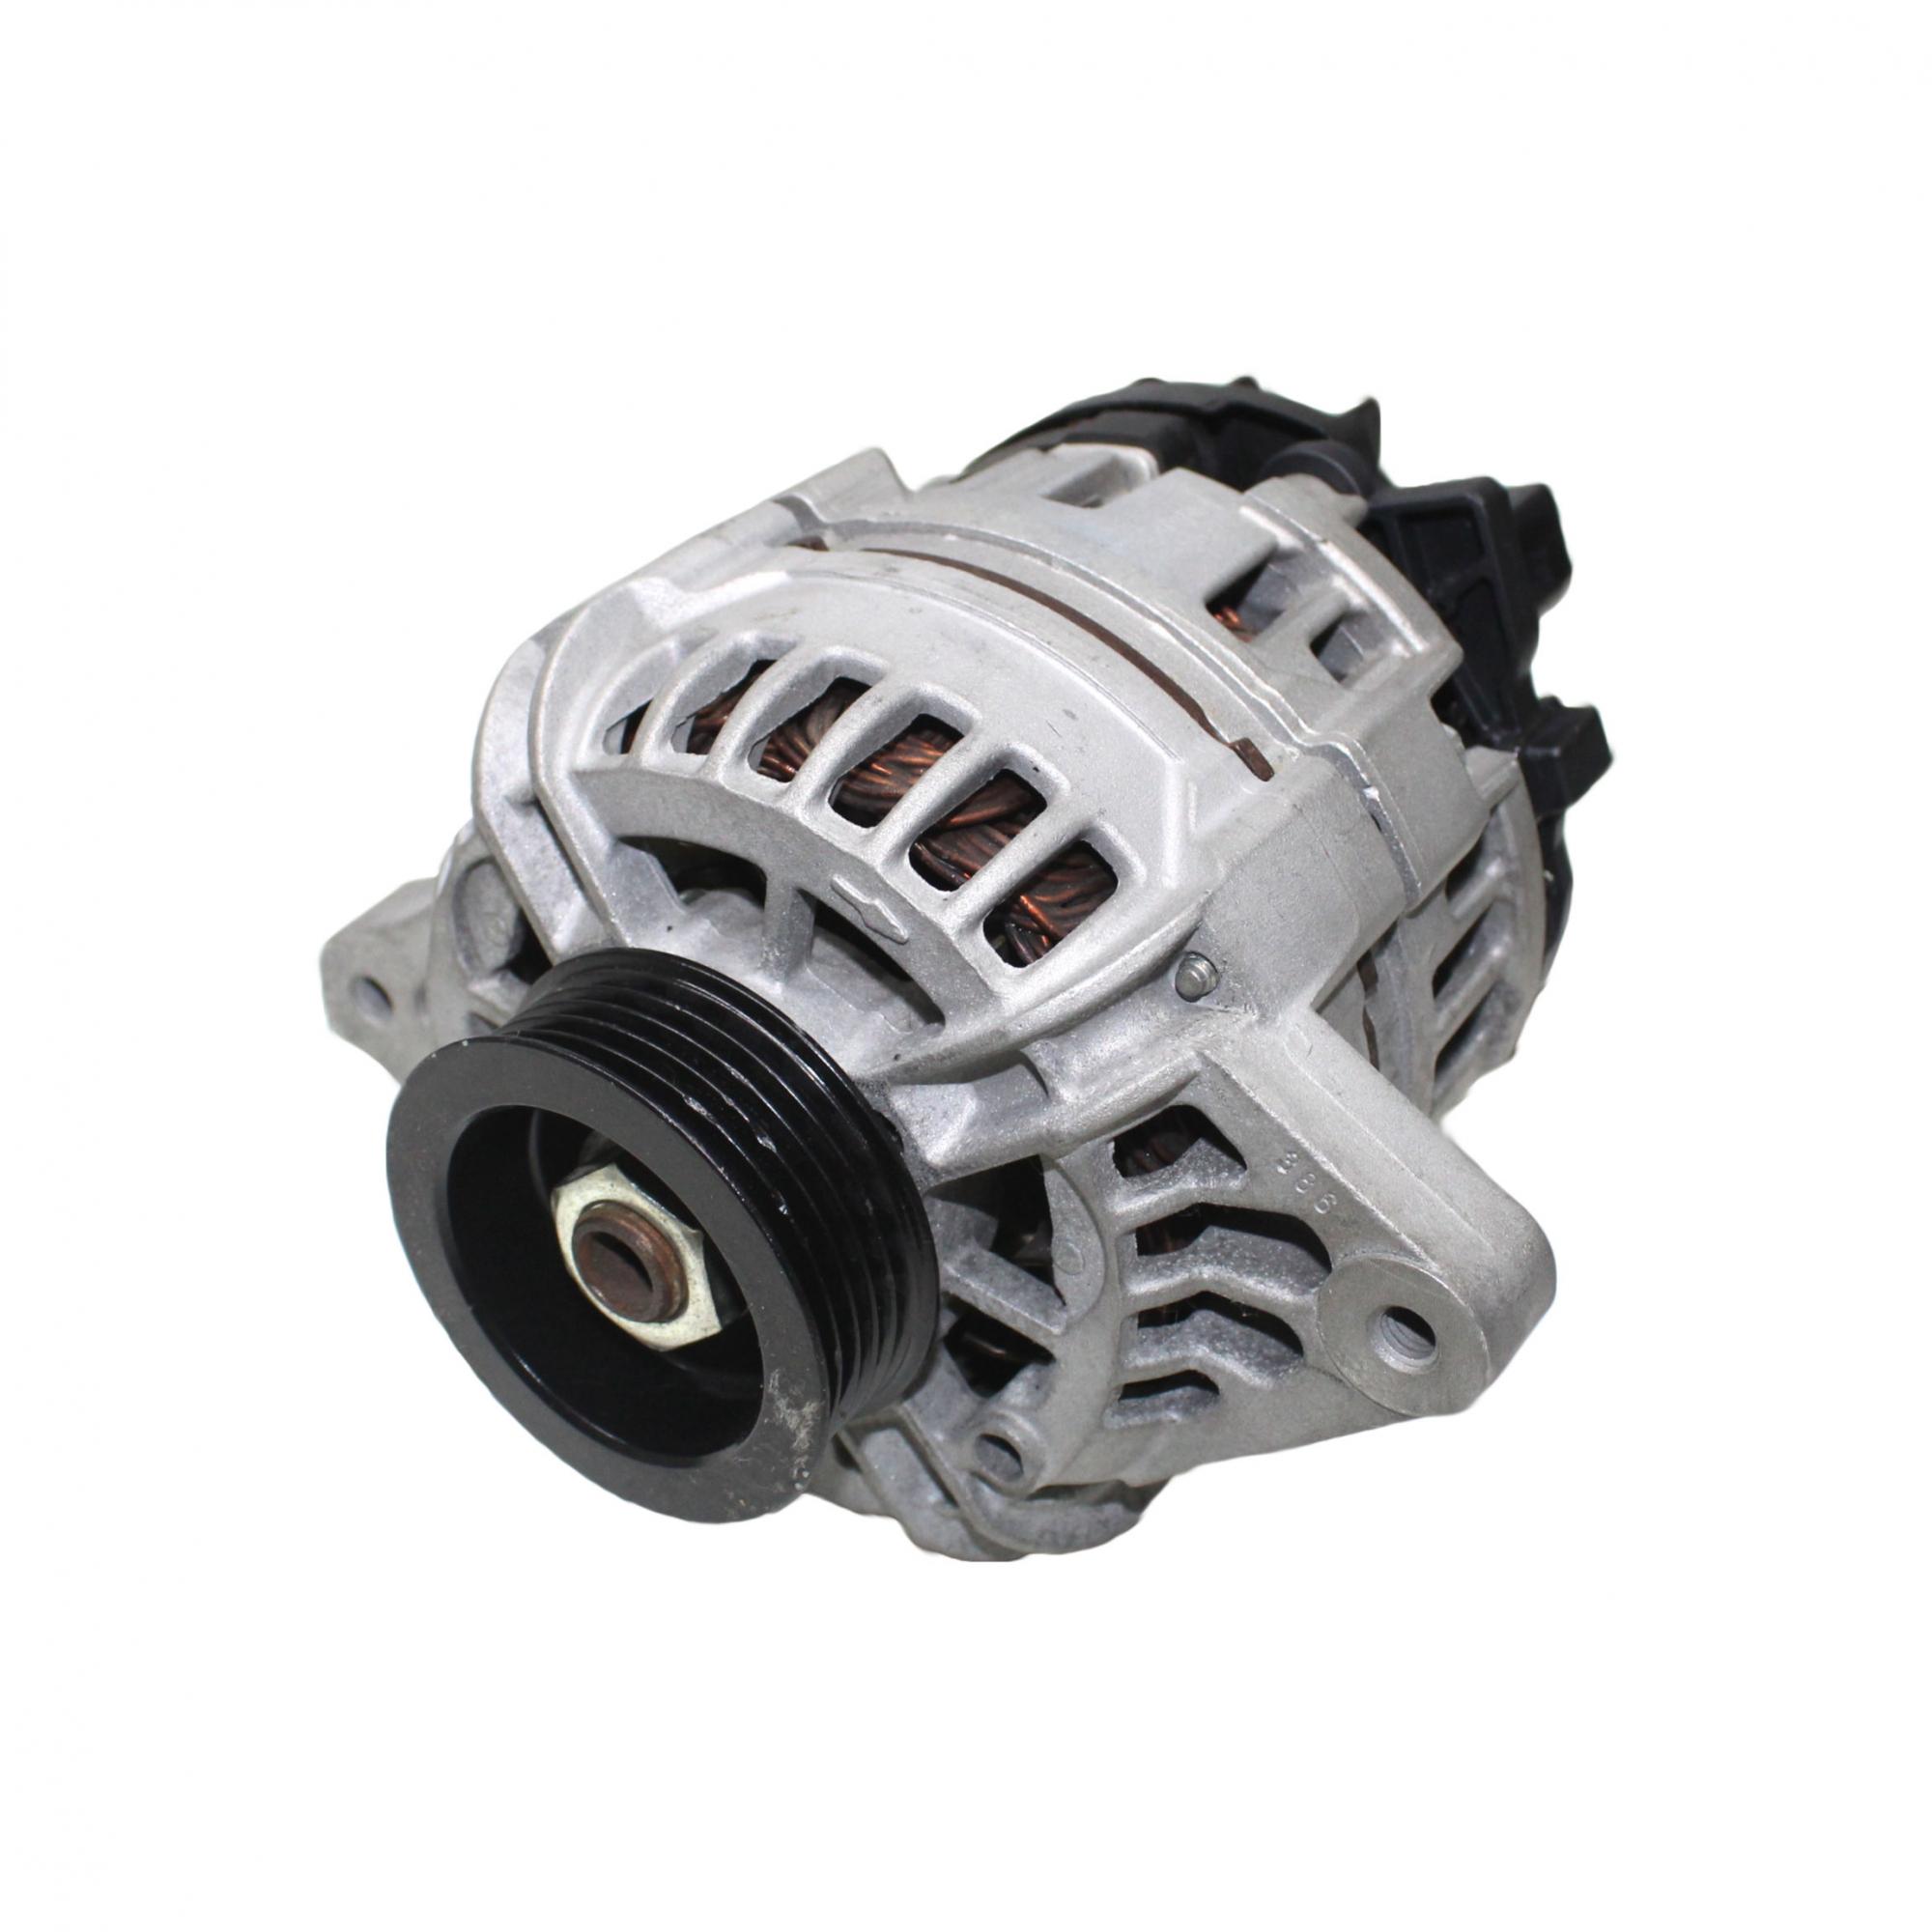 Alternador Bosch 75AH Honda Fit 1.5 07...08 31100PWHM010